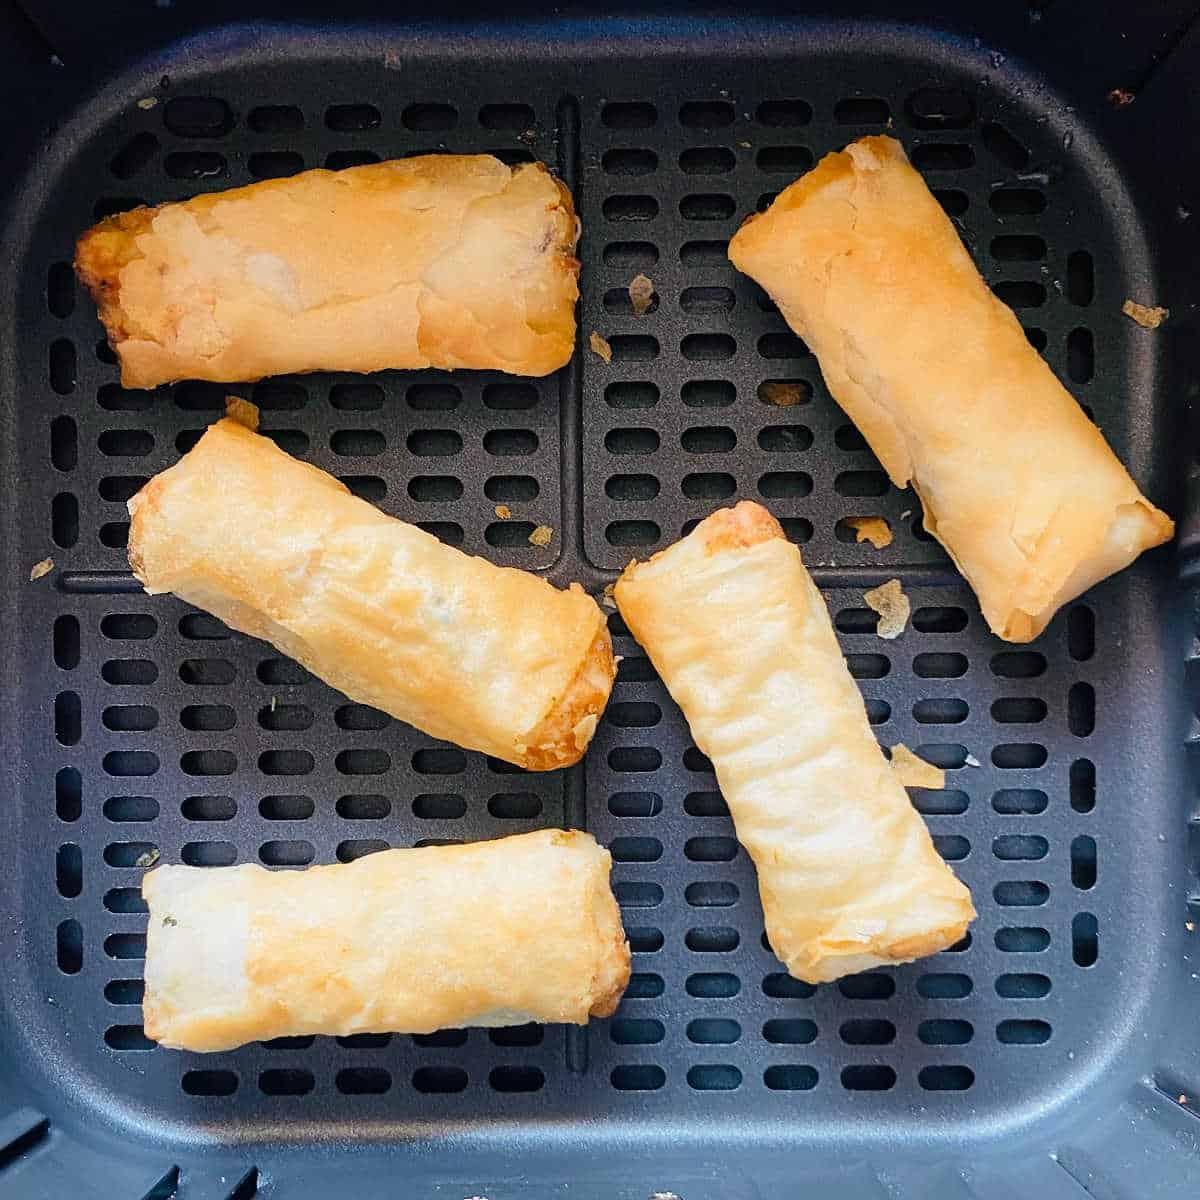 spring rolls aka lumpia frozen in air fryer basket